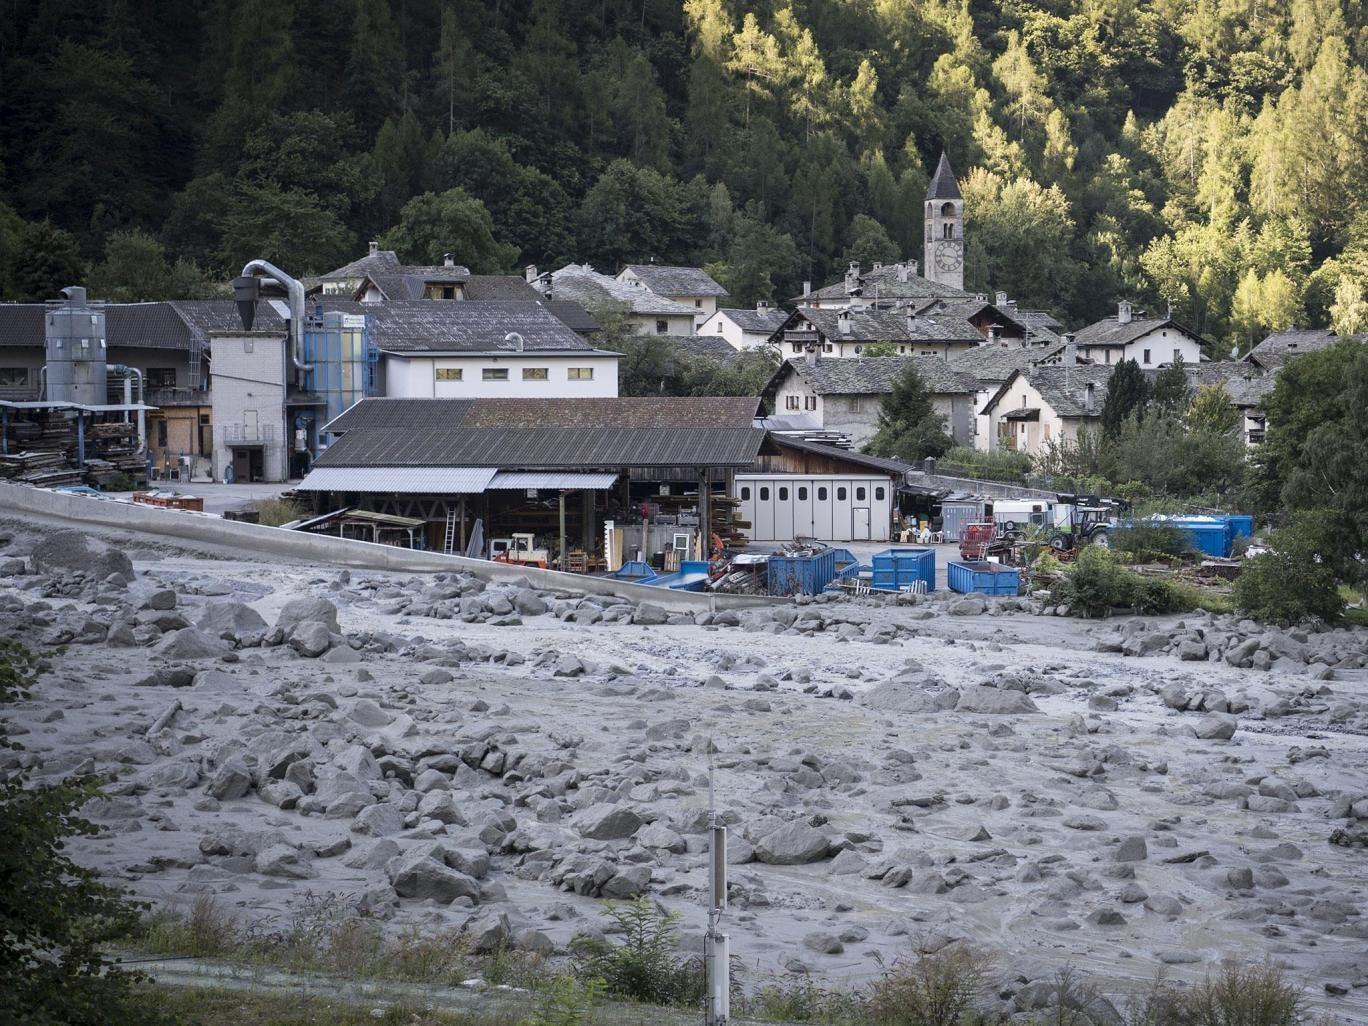 A view of a landslide and the village Bondo in Graubuenden in southeast Switzerland EPA/GIAN EHRENZELLER